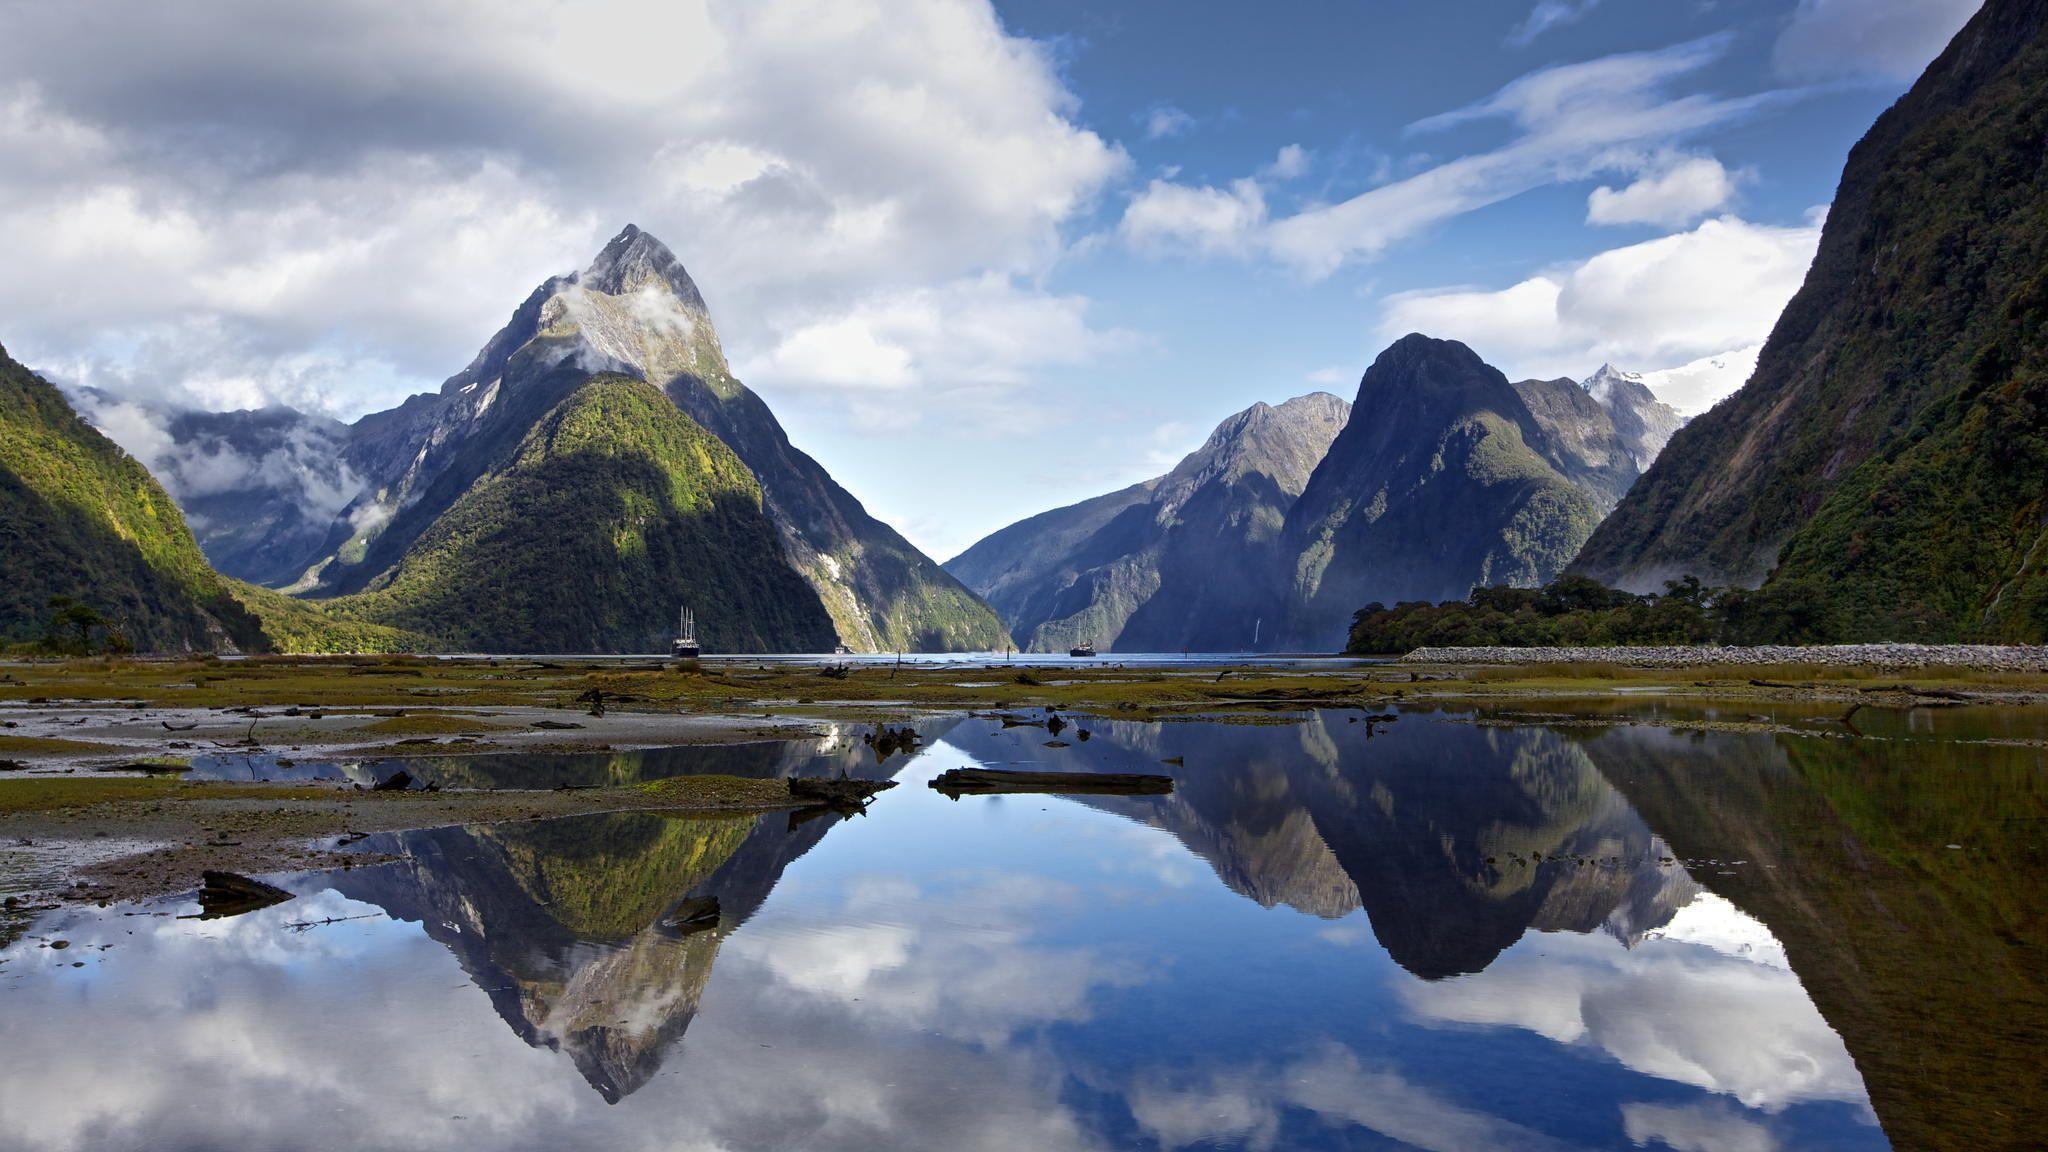 Amoklauf Neuseeland Hd: Milford Sound Wallpapers